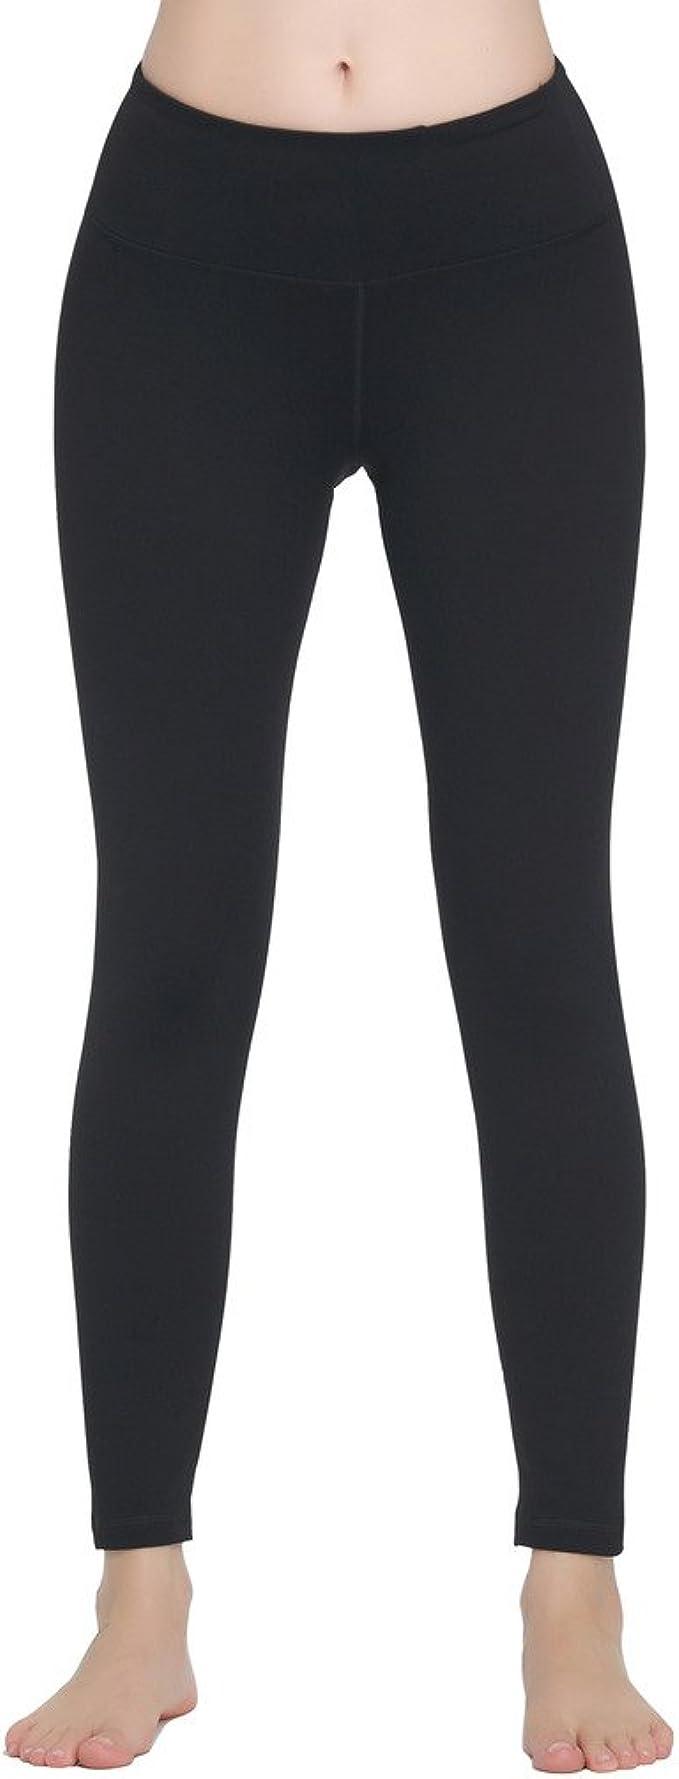 Lover-Beauty Pantalones Yoga Deportivas Mujer Leggins Elastico ...